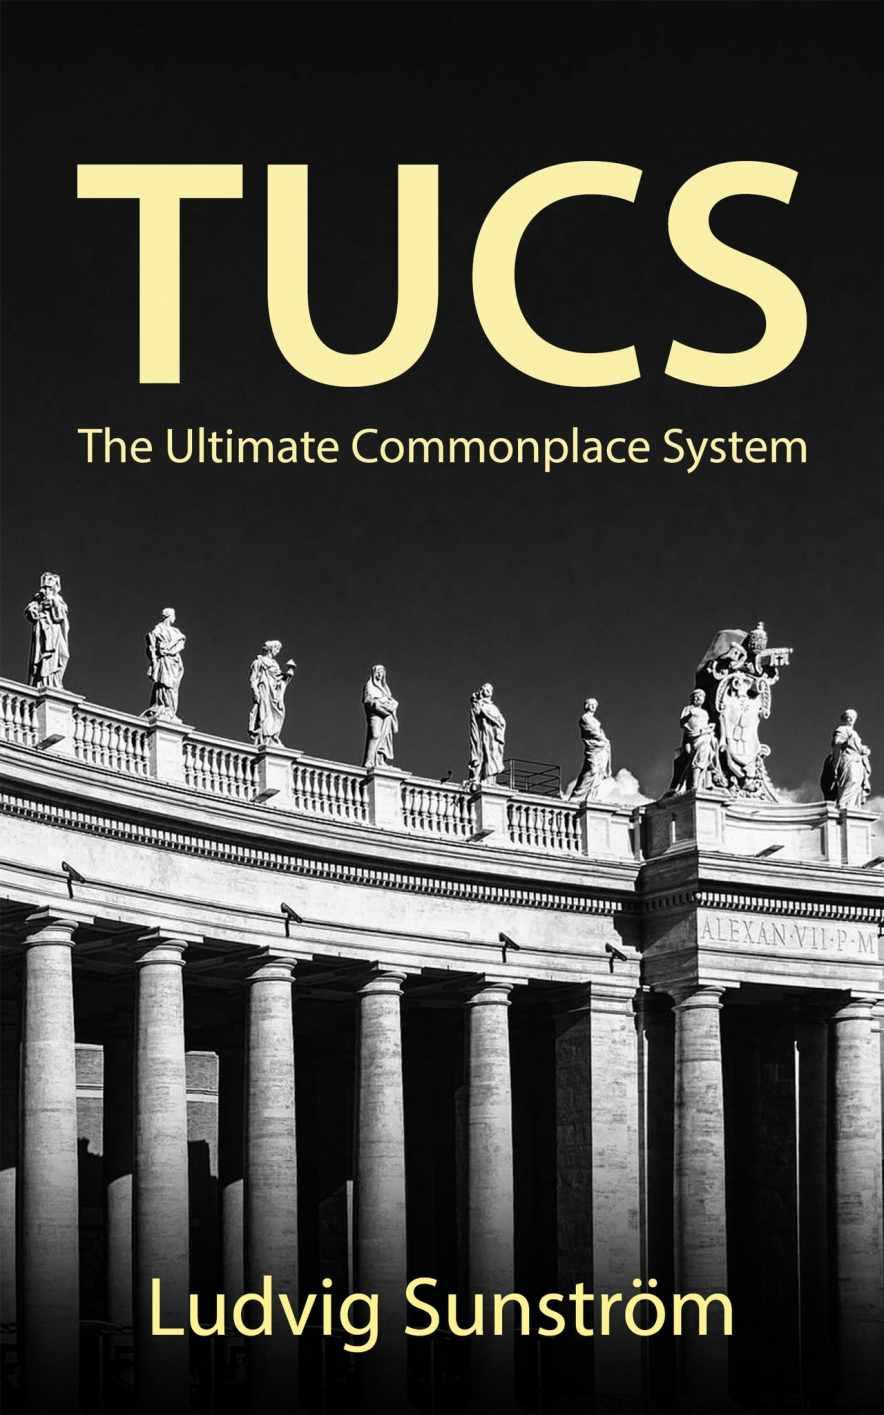 TUCS 2.0 Released in July 2018